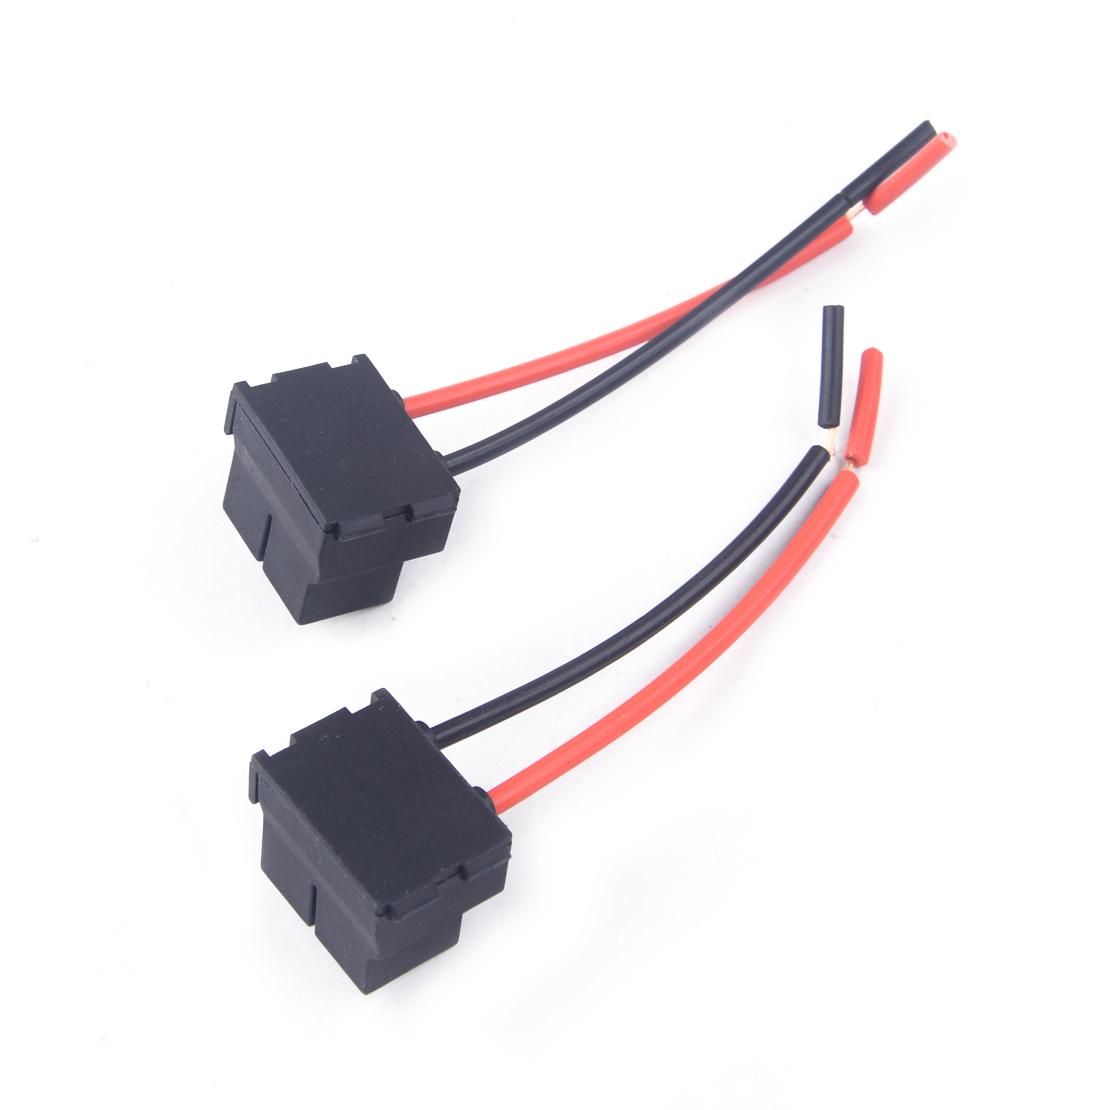 2x H7 Headlight Bulb Ceramic Socket Plug Connector Wiring Harness Male to Female